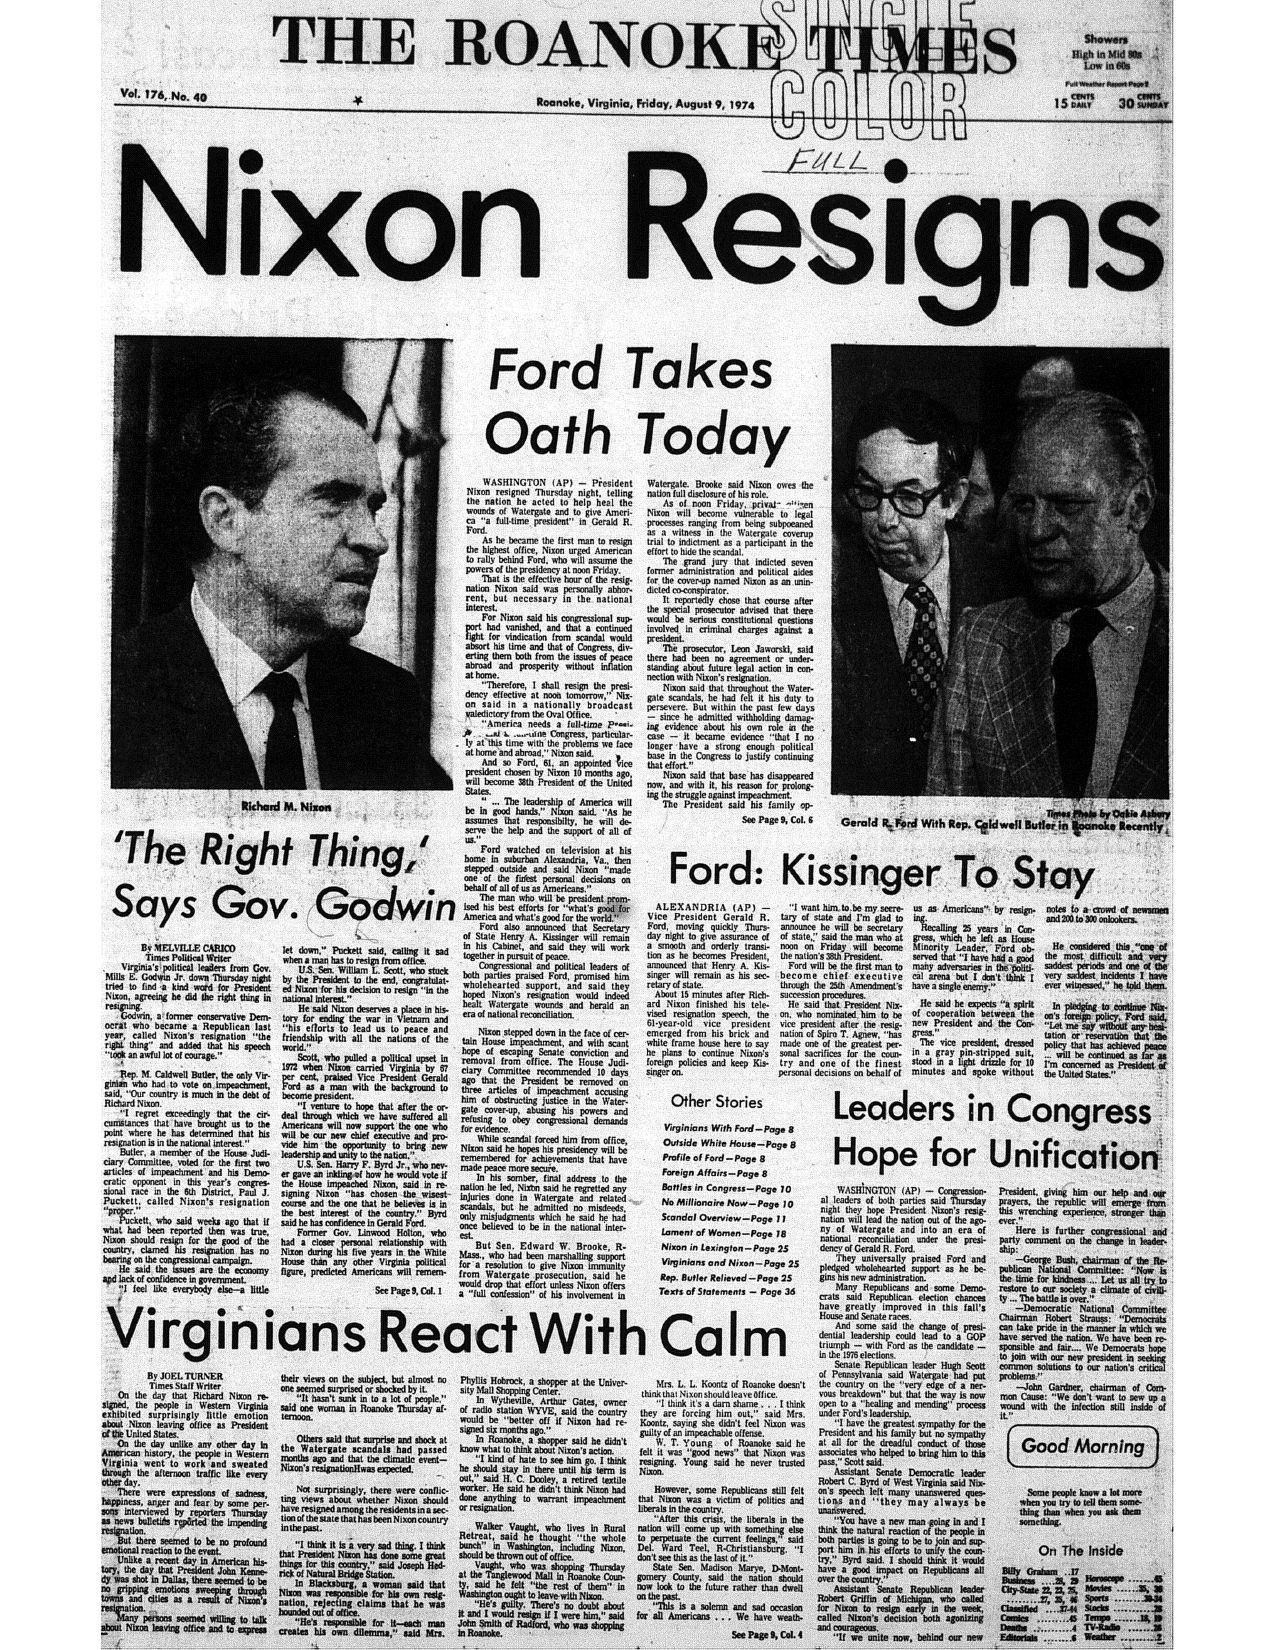 After Nixon Resigned In 1974 Reporter Joel Turner Wrote That